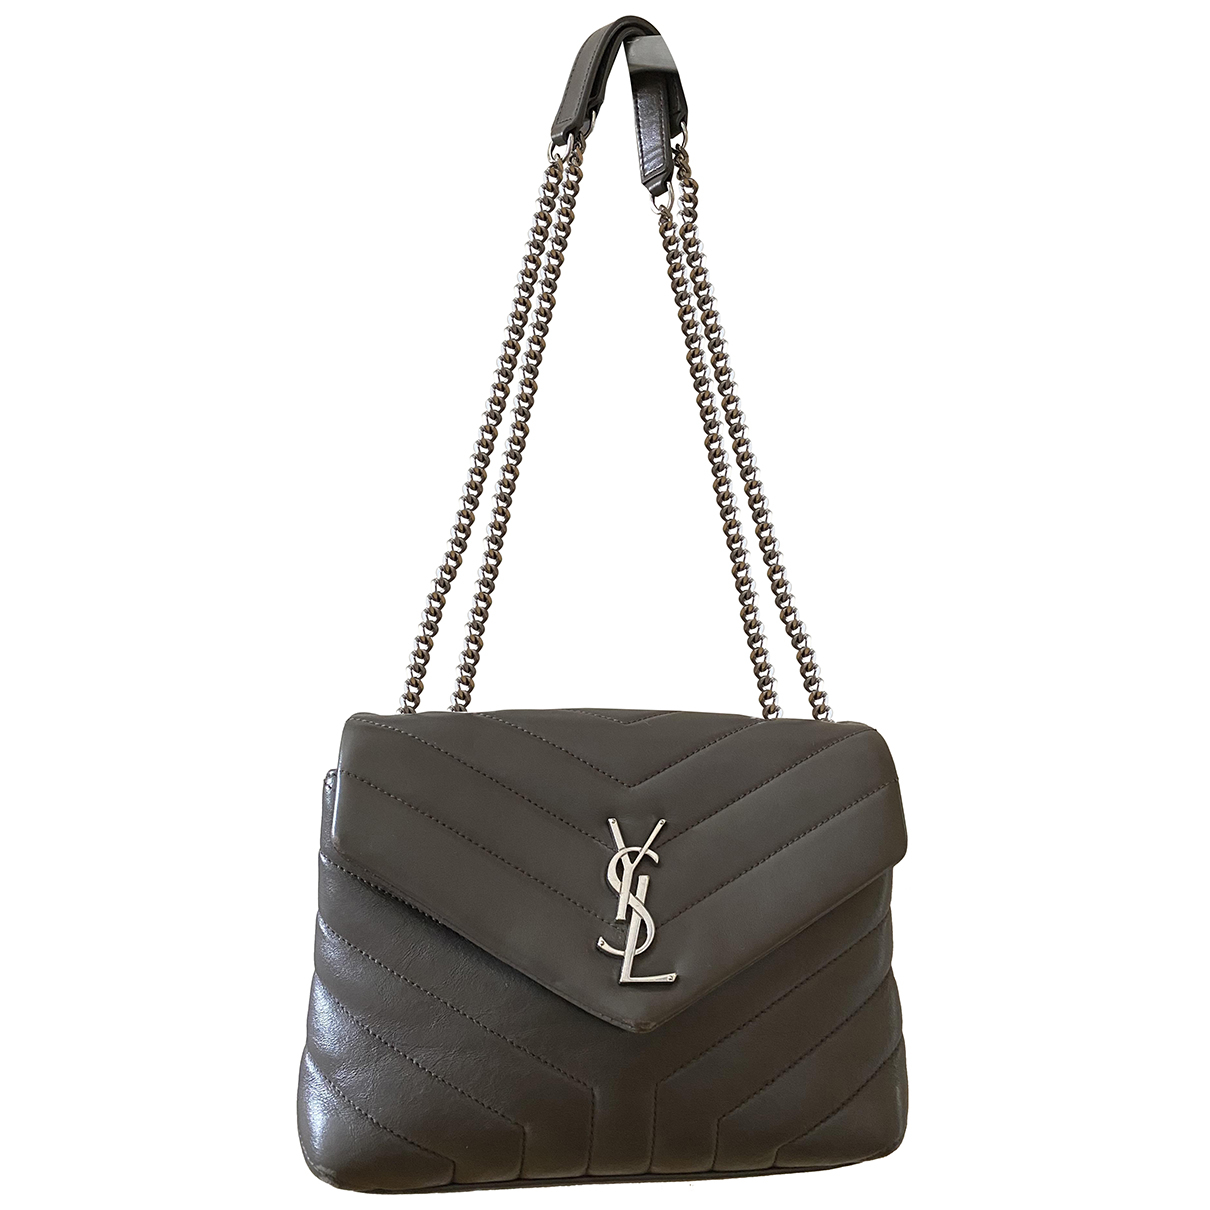 Saint Laurent Loulou Handtasche in  Grau Leder